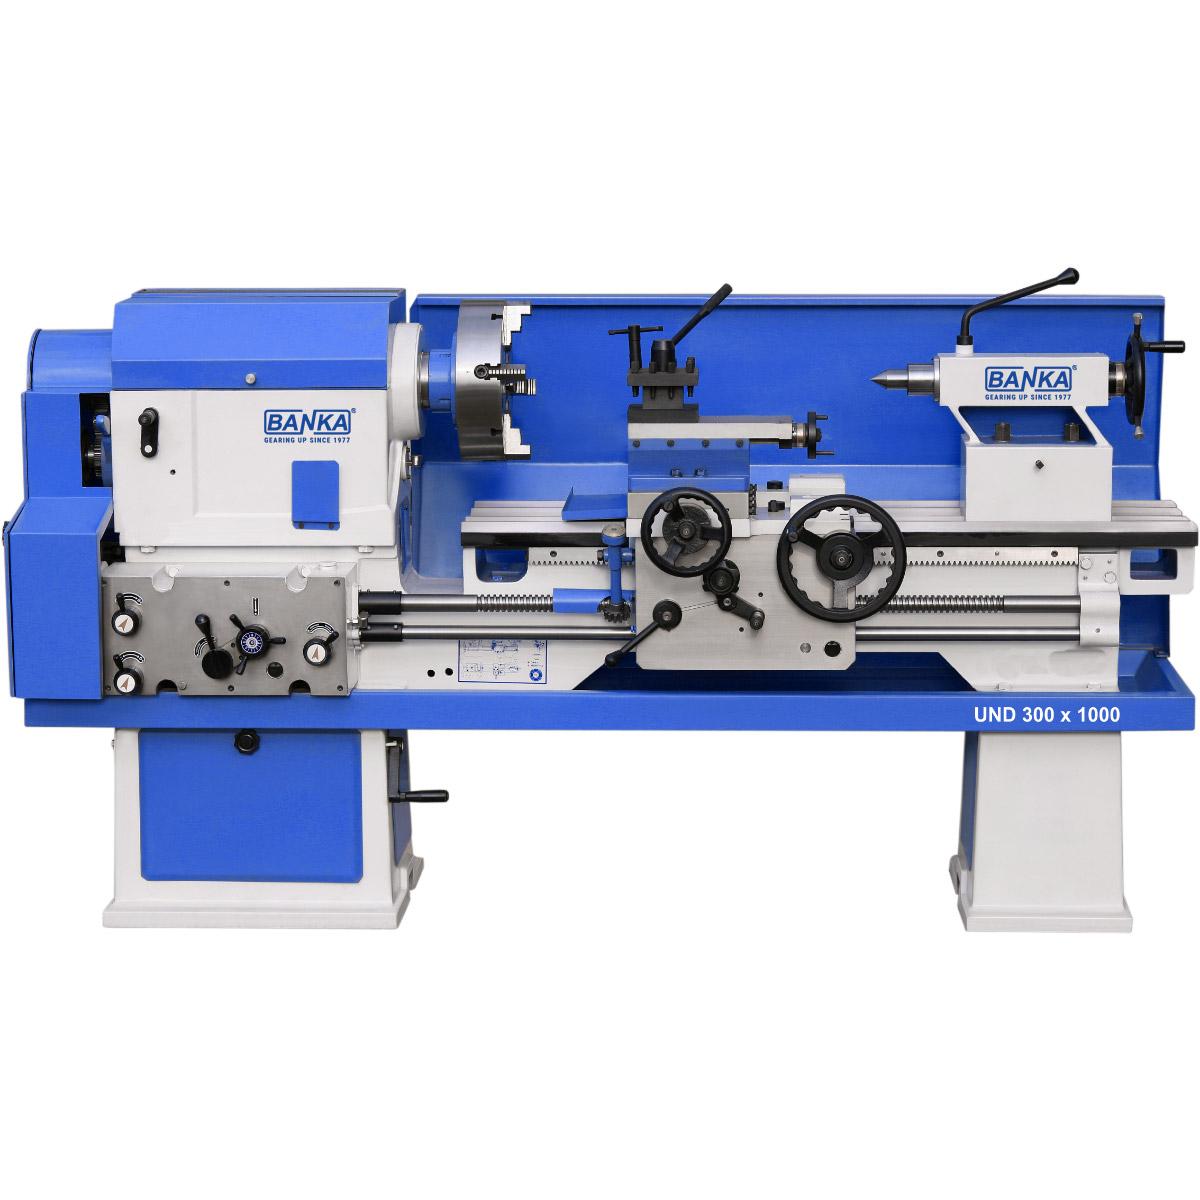 Medium Duty Lathe Machines - Cone Pulley Lathe - Lathe ...